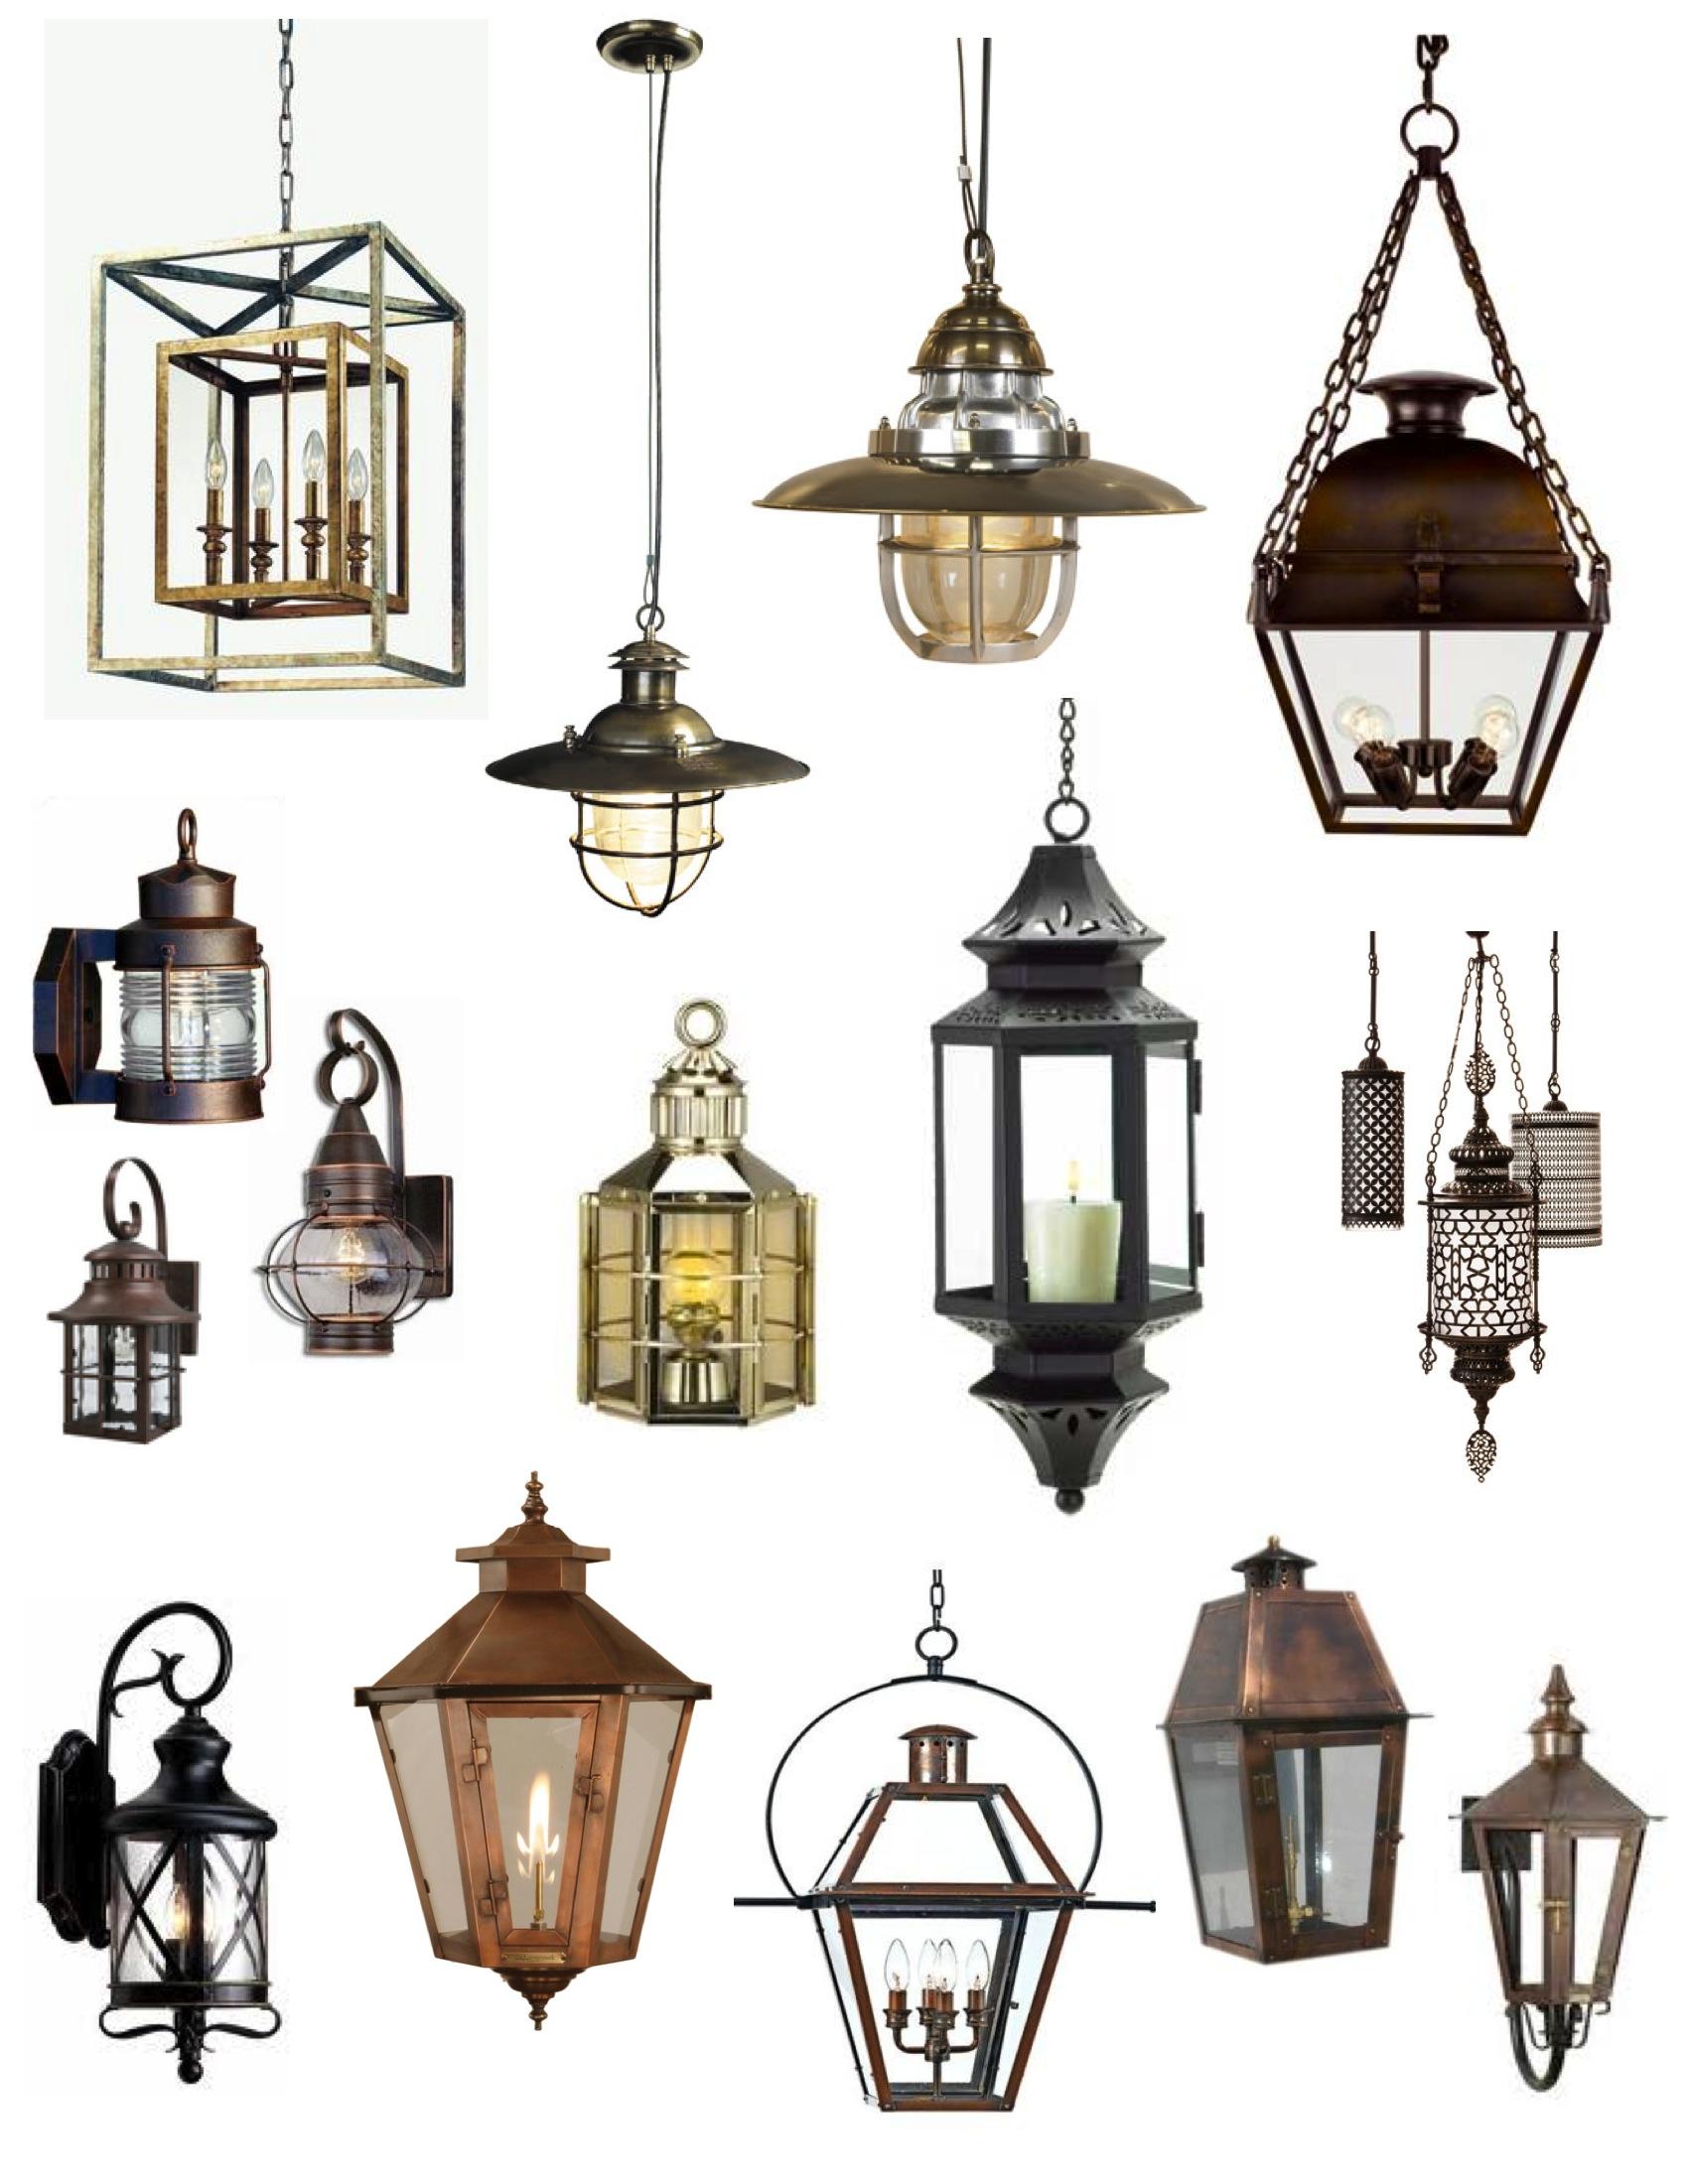 the illumination of lantern lighting house appeal. Black Bedroom Furniture Sets. Home Design Ideas